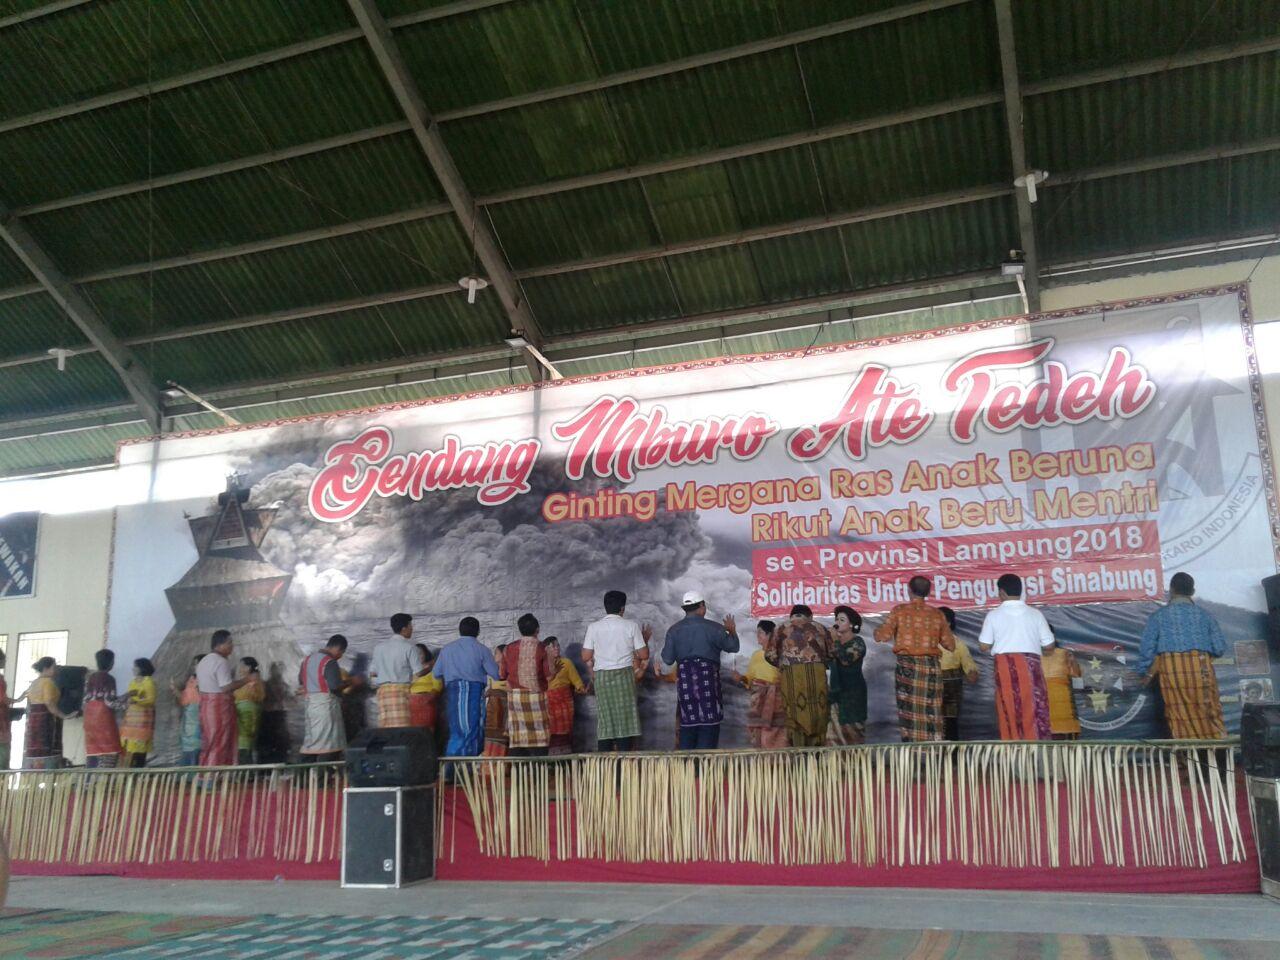 Perpulunggen Ginting Gelar Silaturahmi